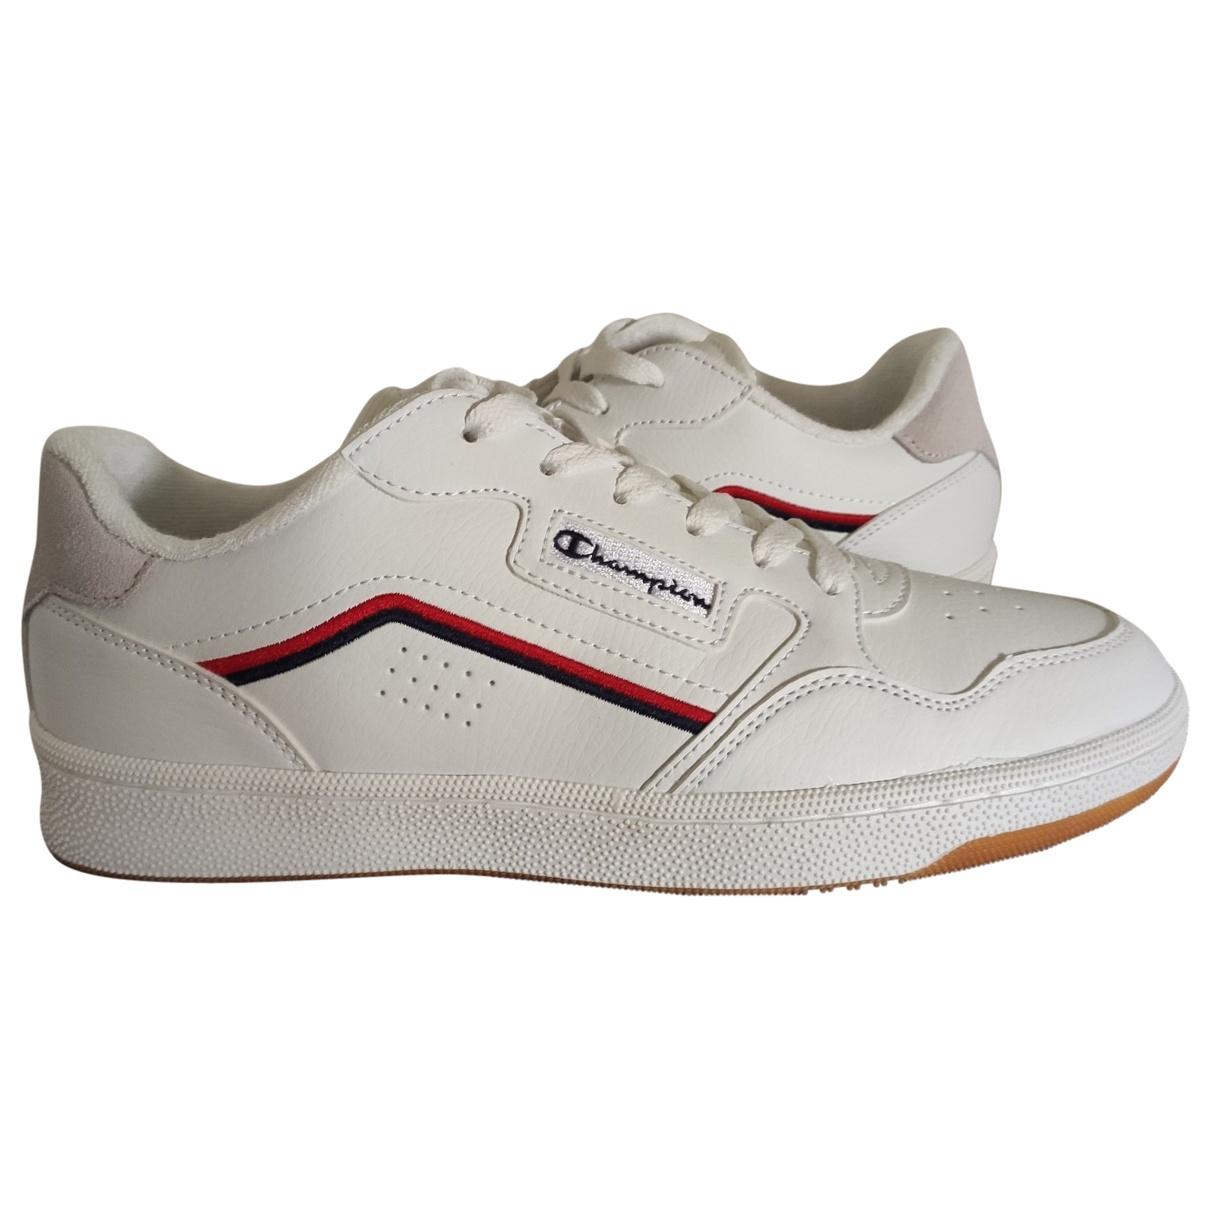 Champion \N Sneakers in  Weiss Leder